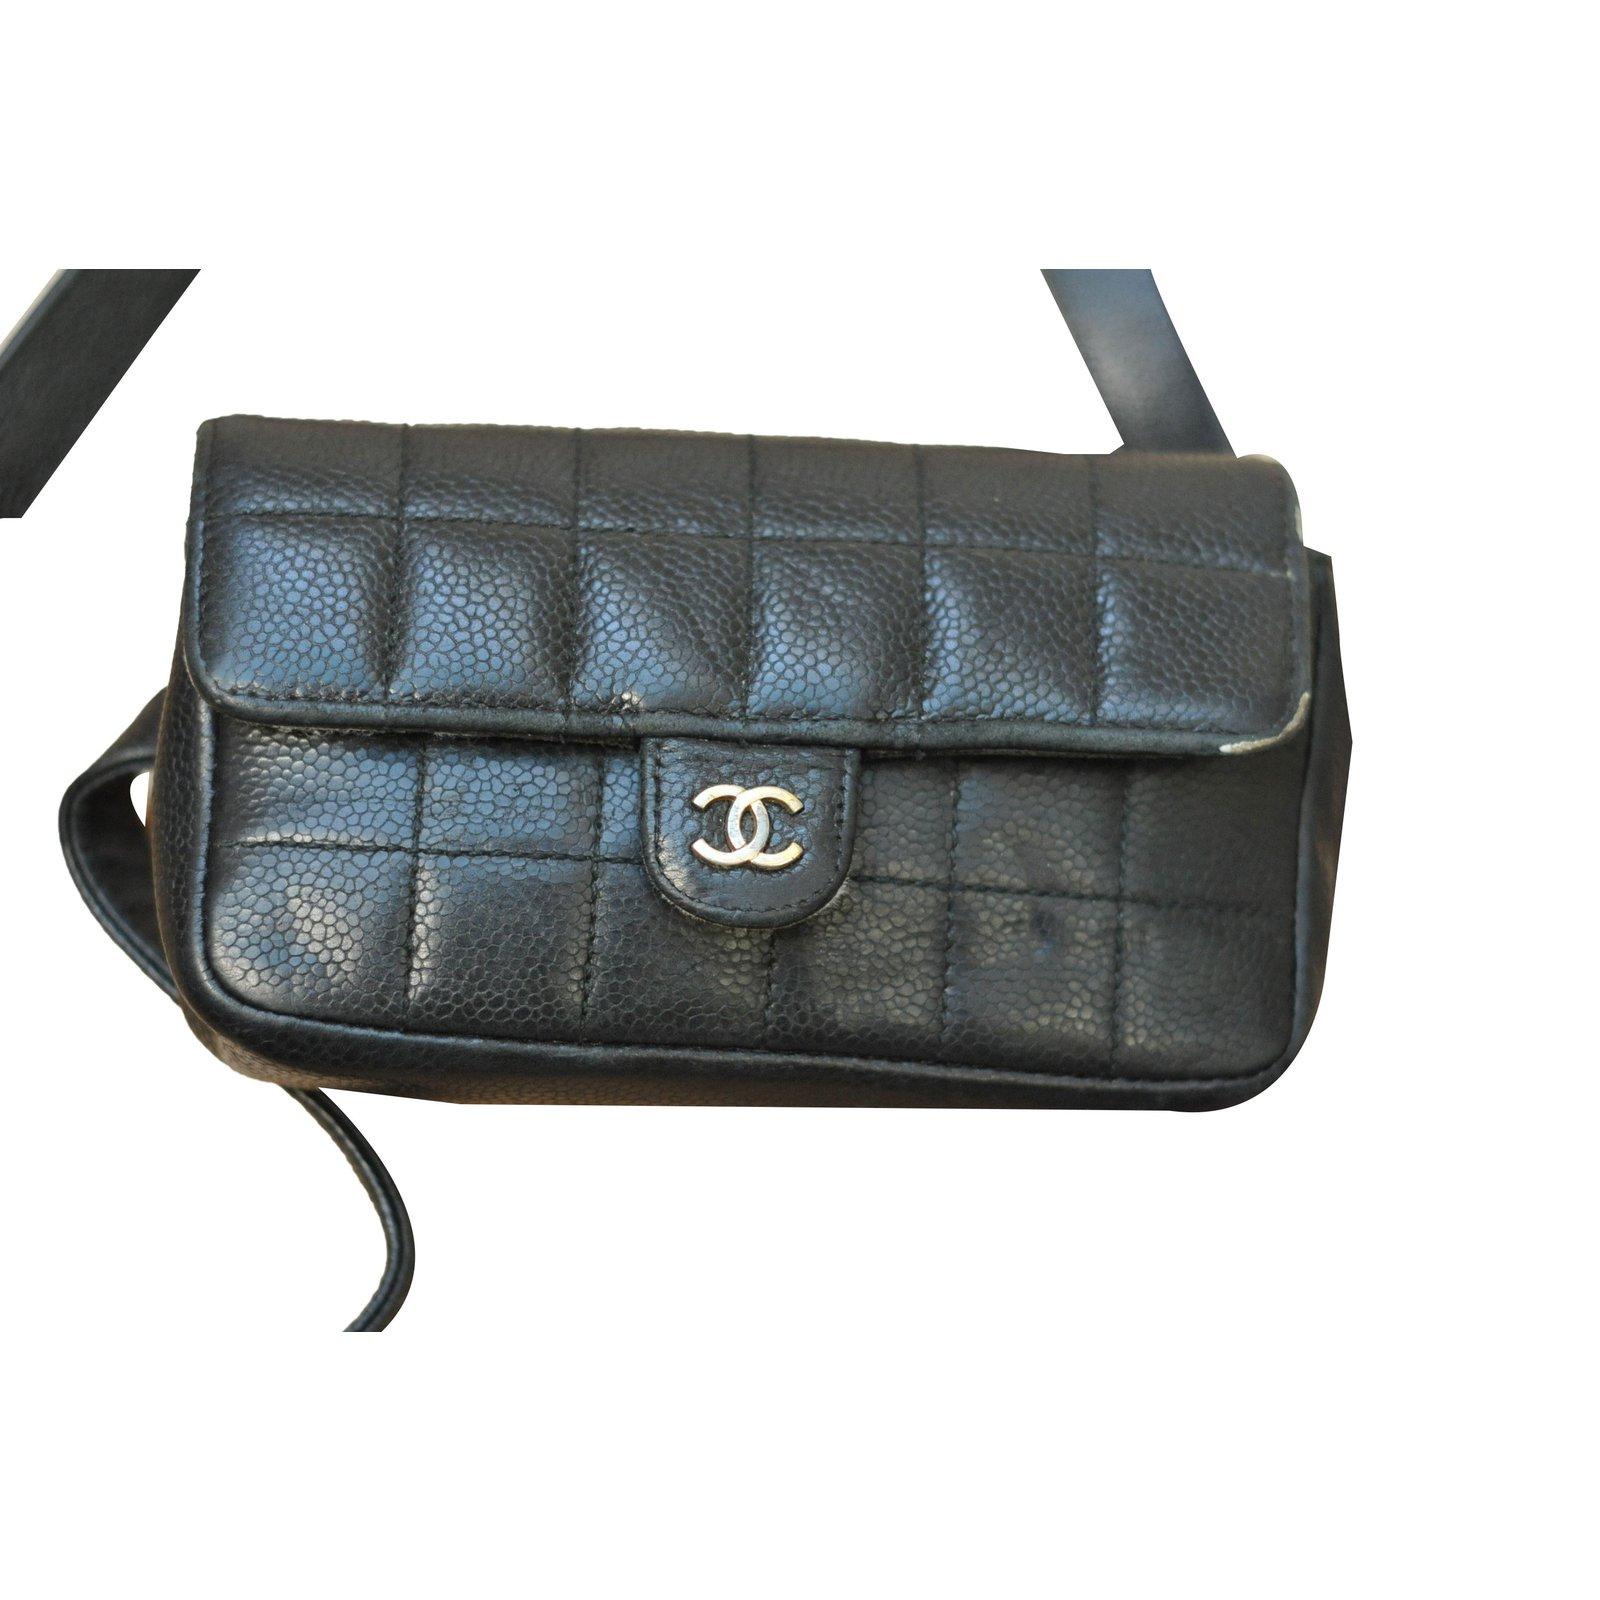 Chanel Uniform belt bag Clutch bags Leather Black ref ...